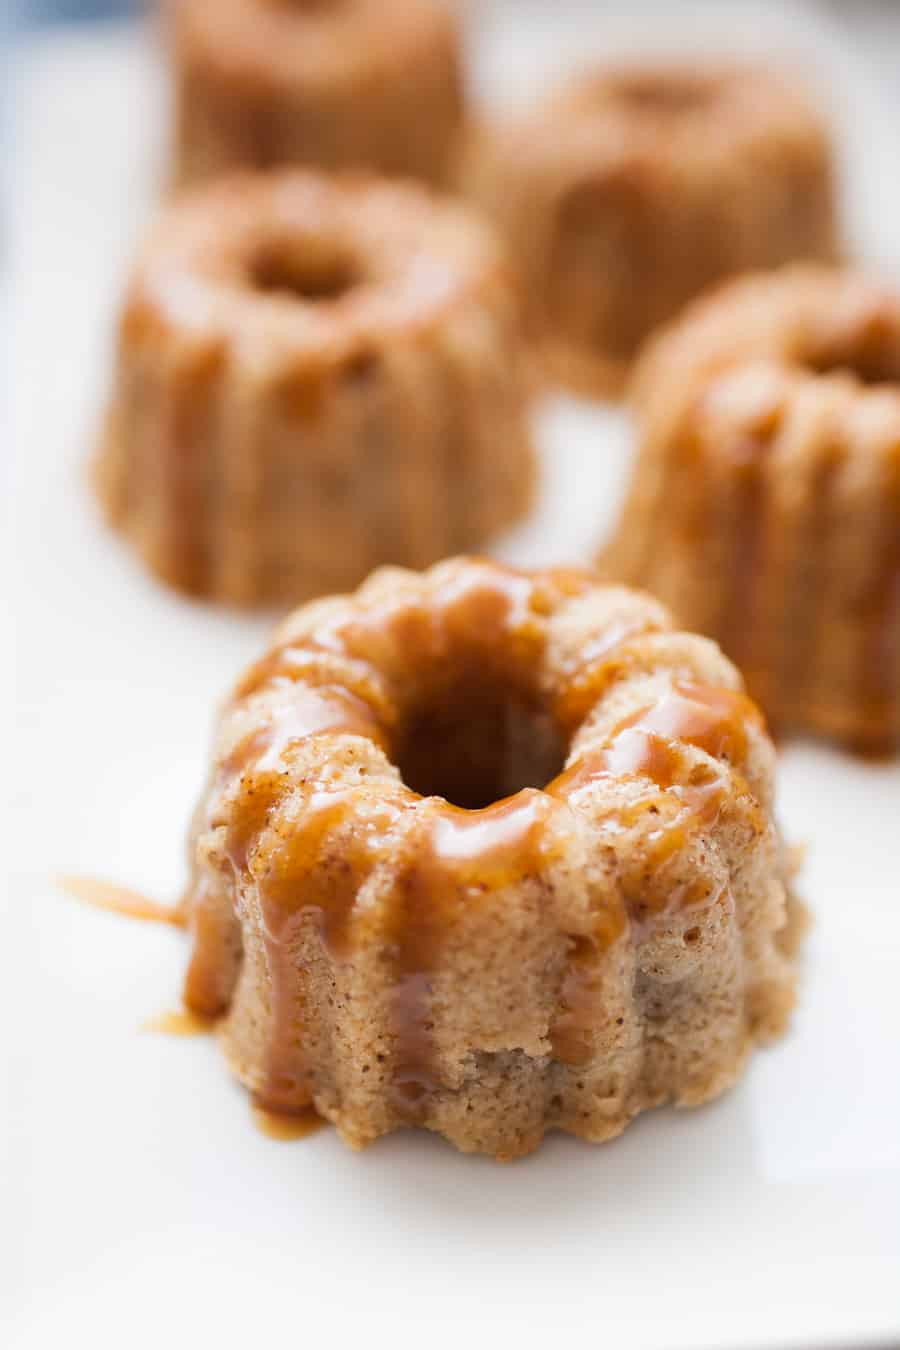 Thanksgiving Desserts Not Pie  45 Thanksgiving Desserts That Are Not Pie • A Joyfully Mad